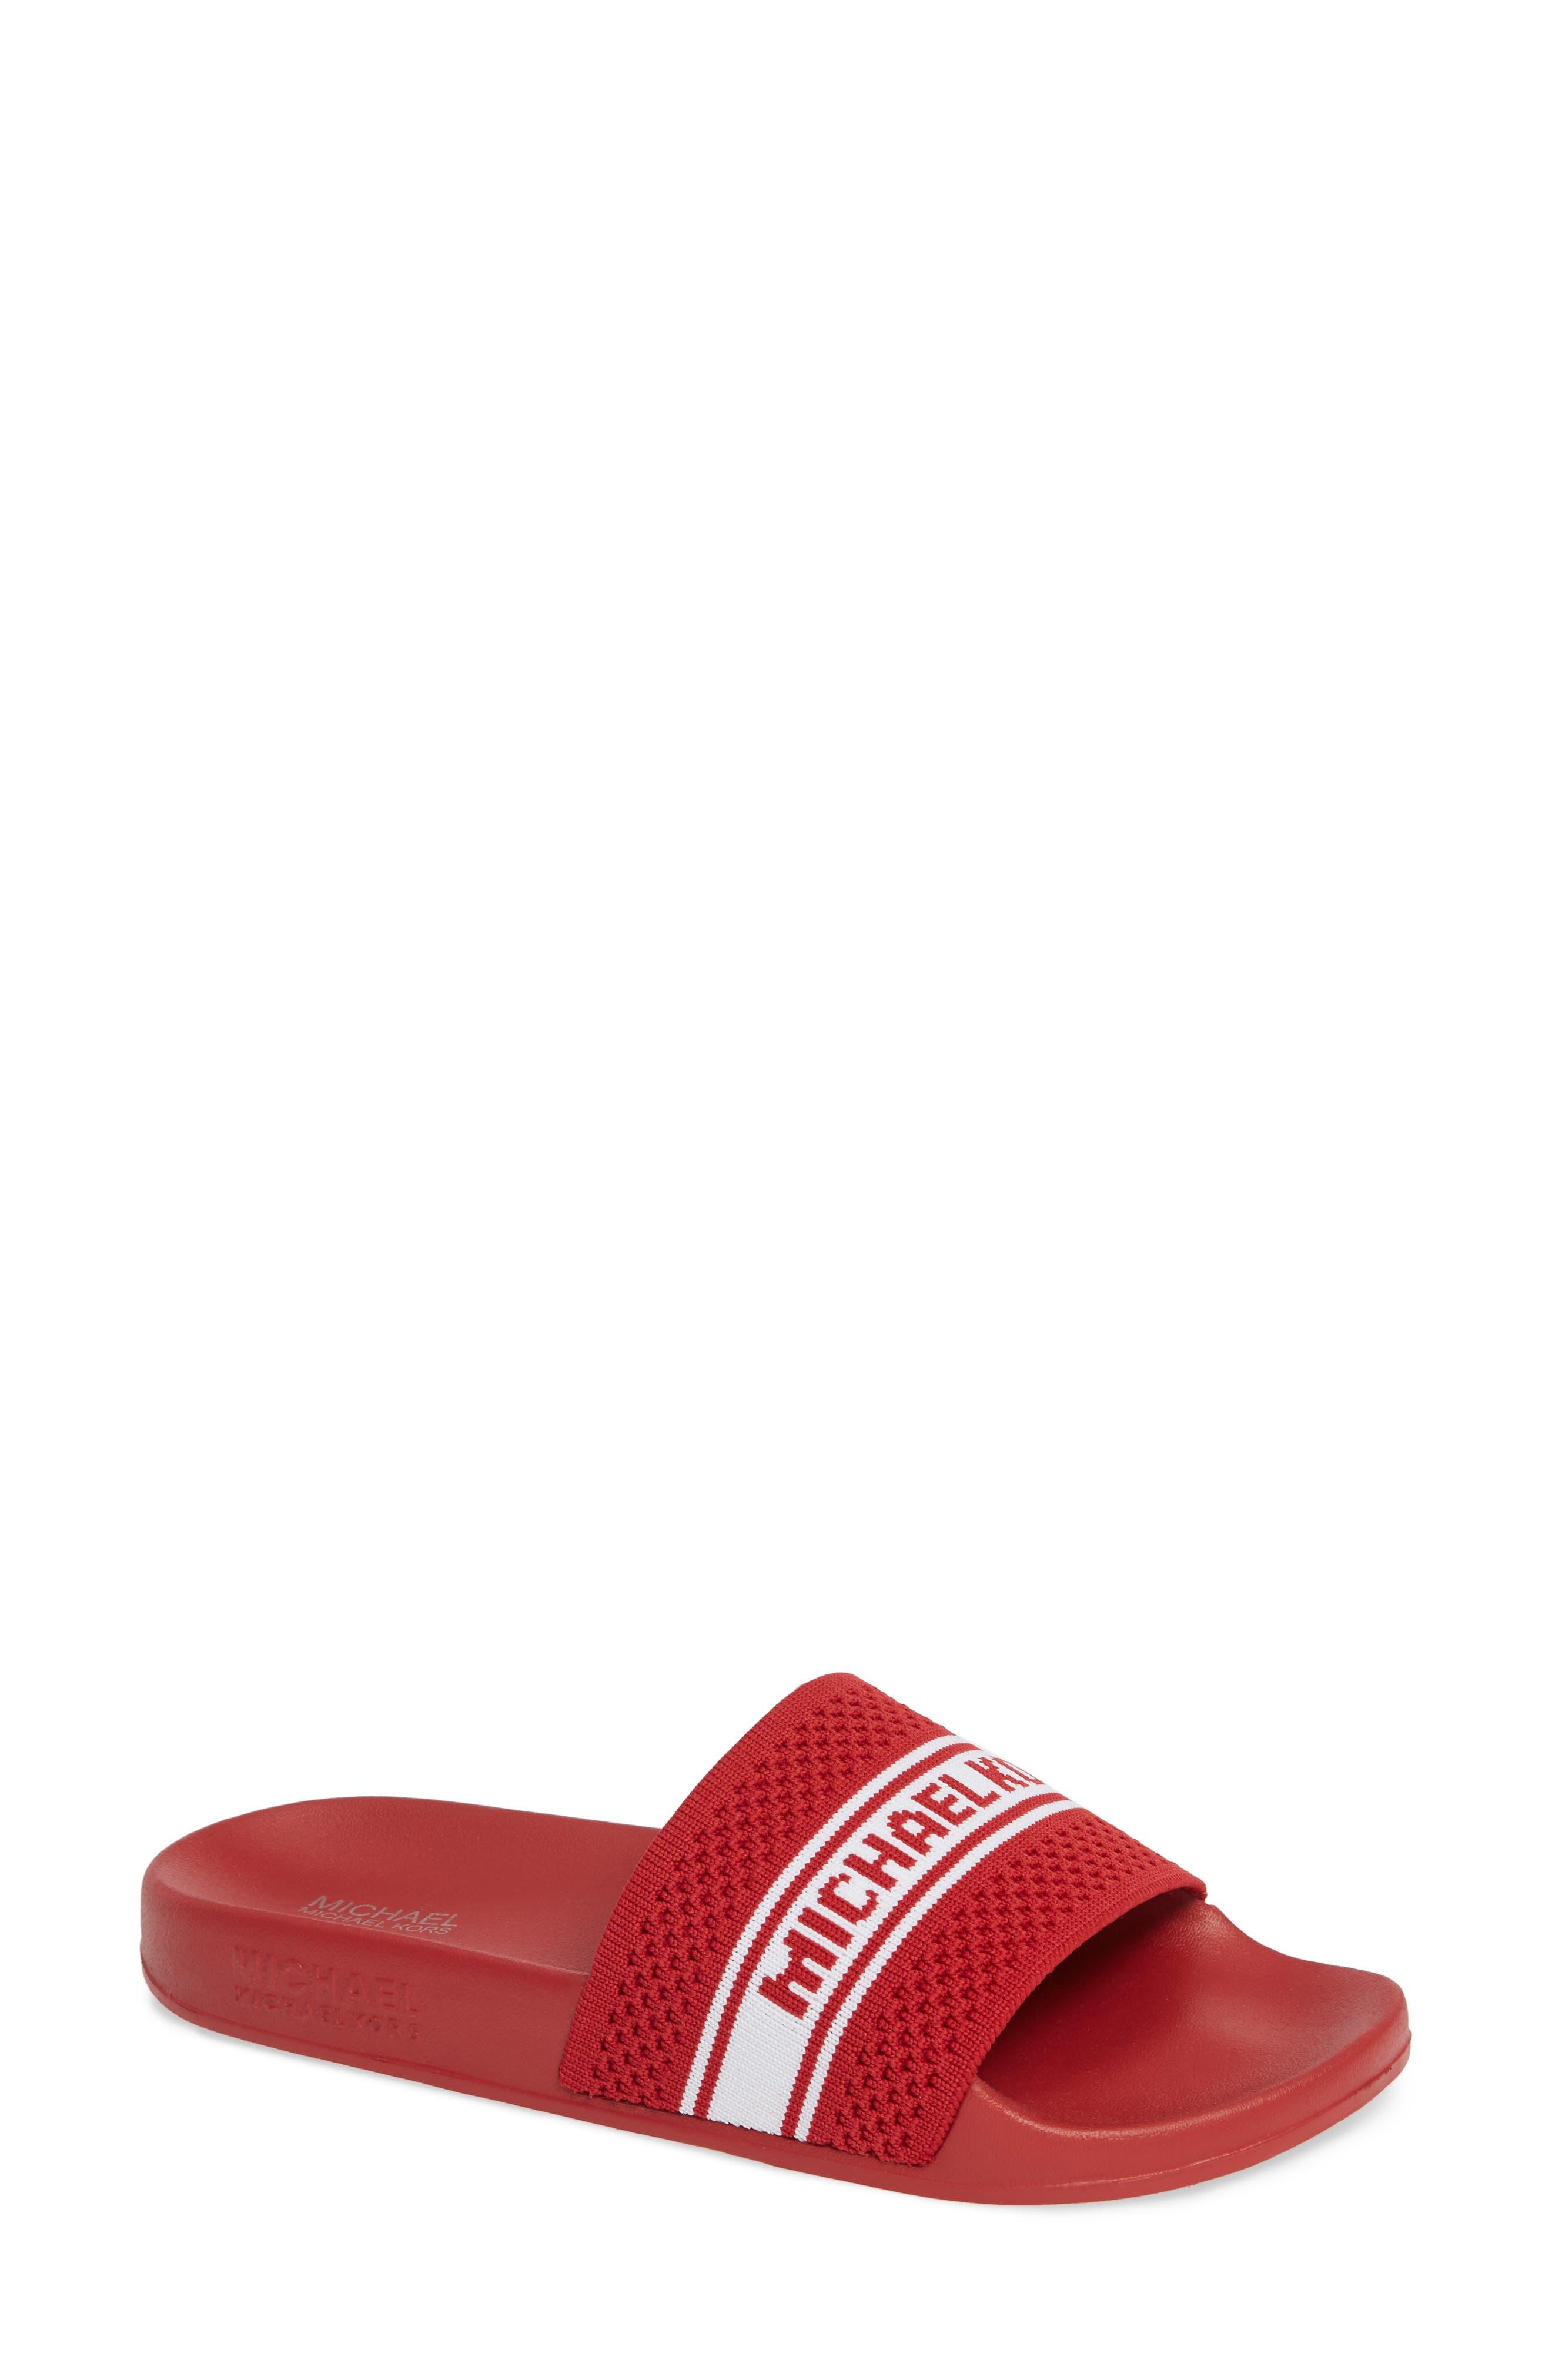 MICHAEL MICHAEL KORS Gilmore Slide Sandal, Main, color, BRIGHT RED FABRIC